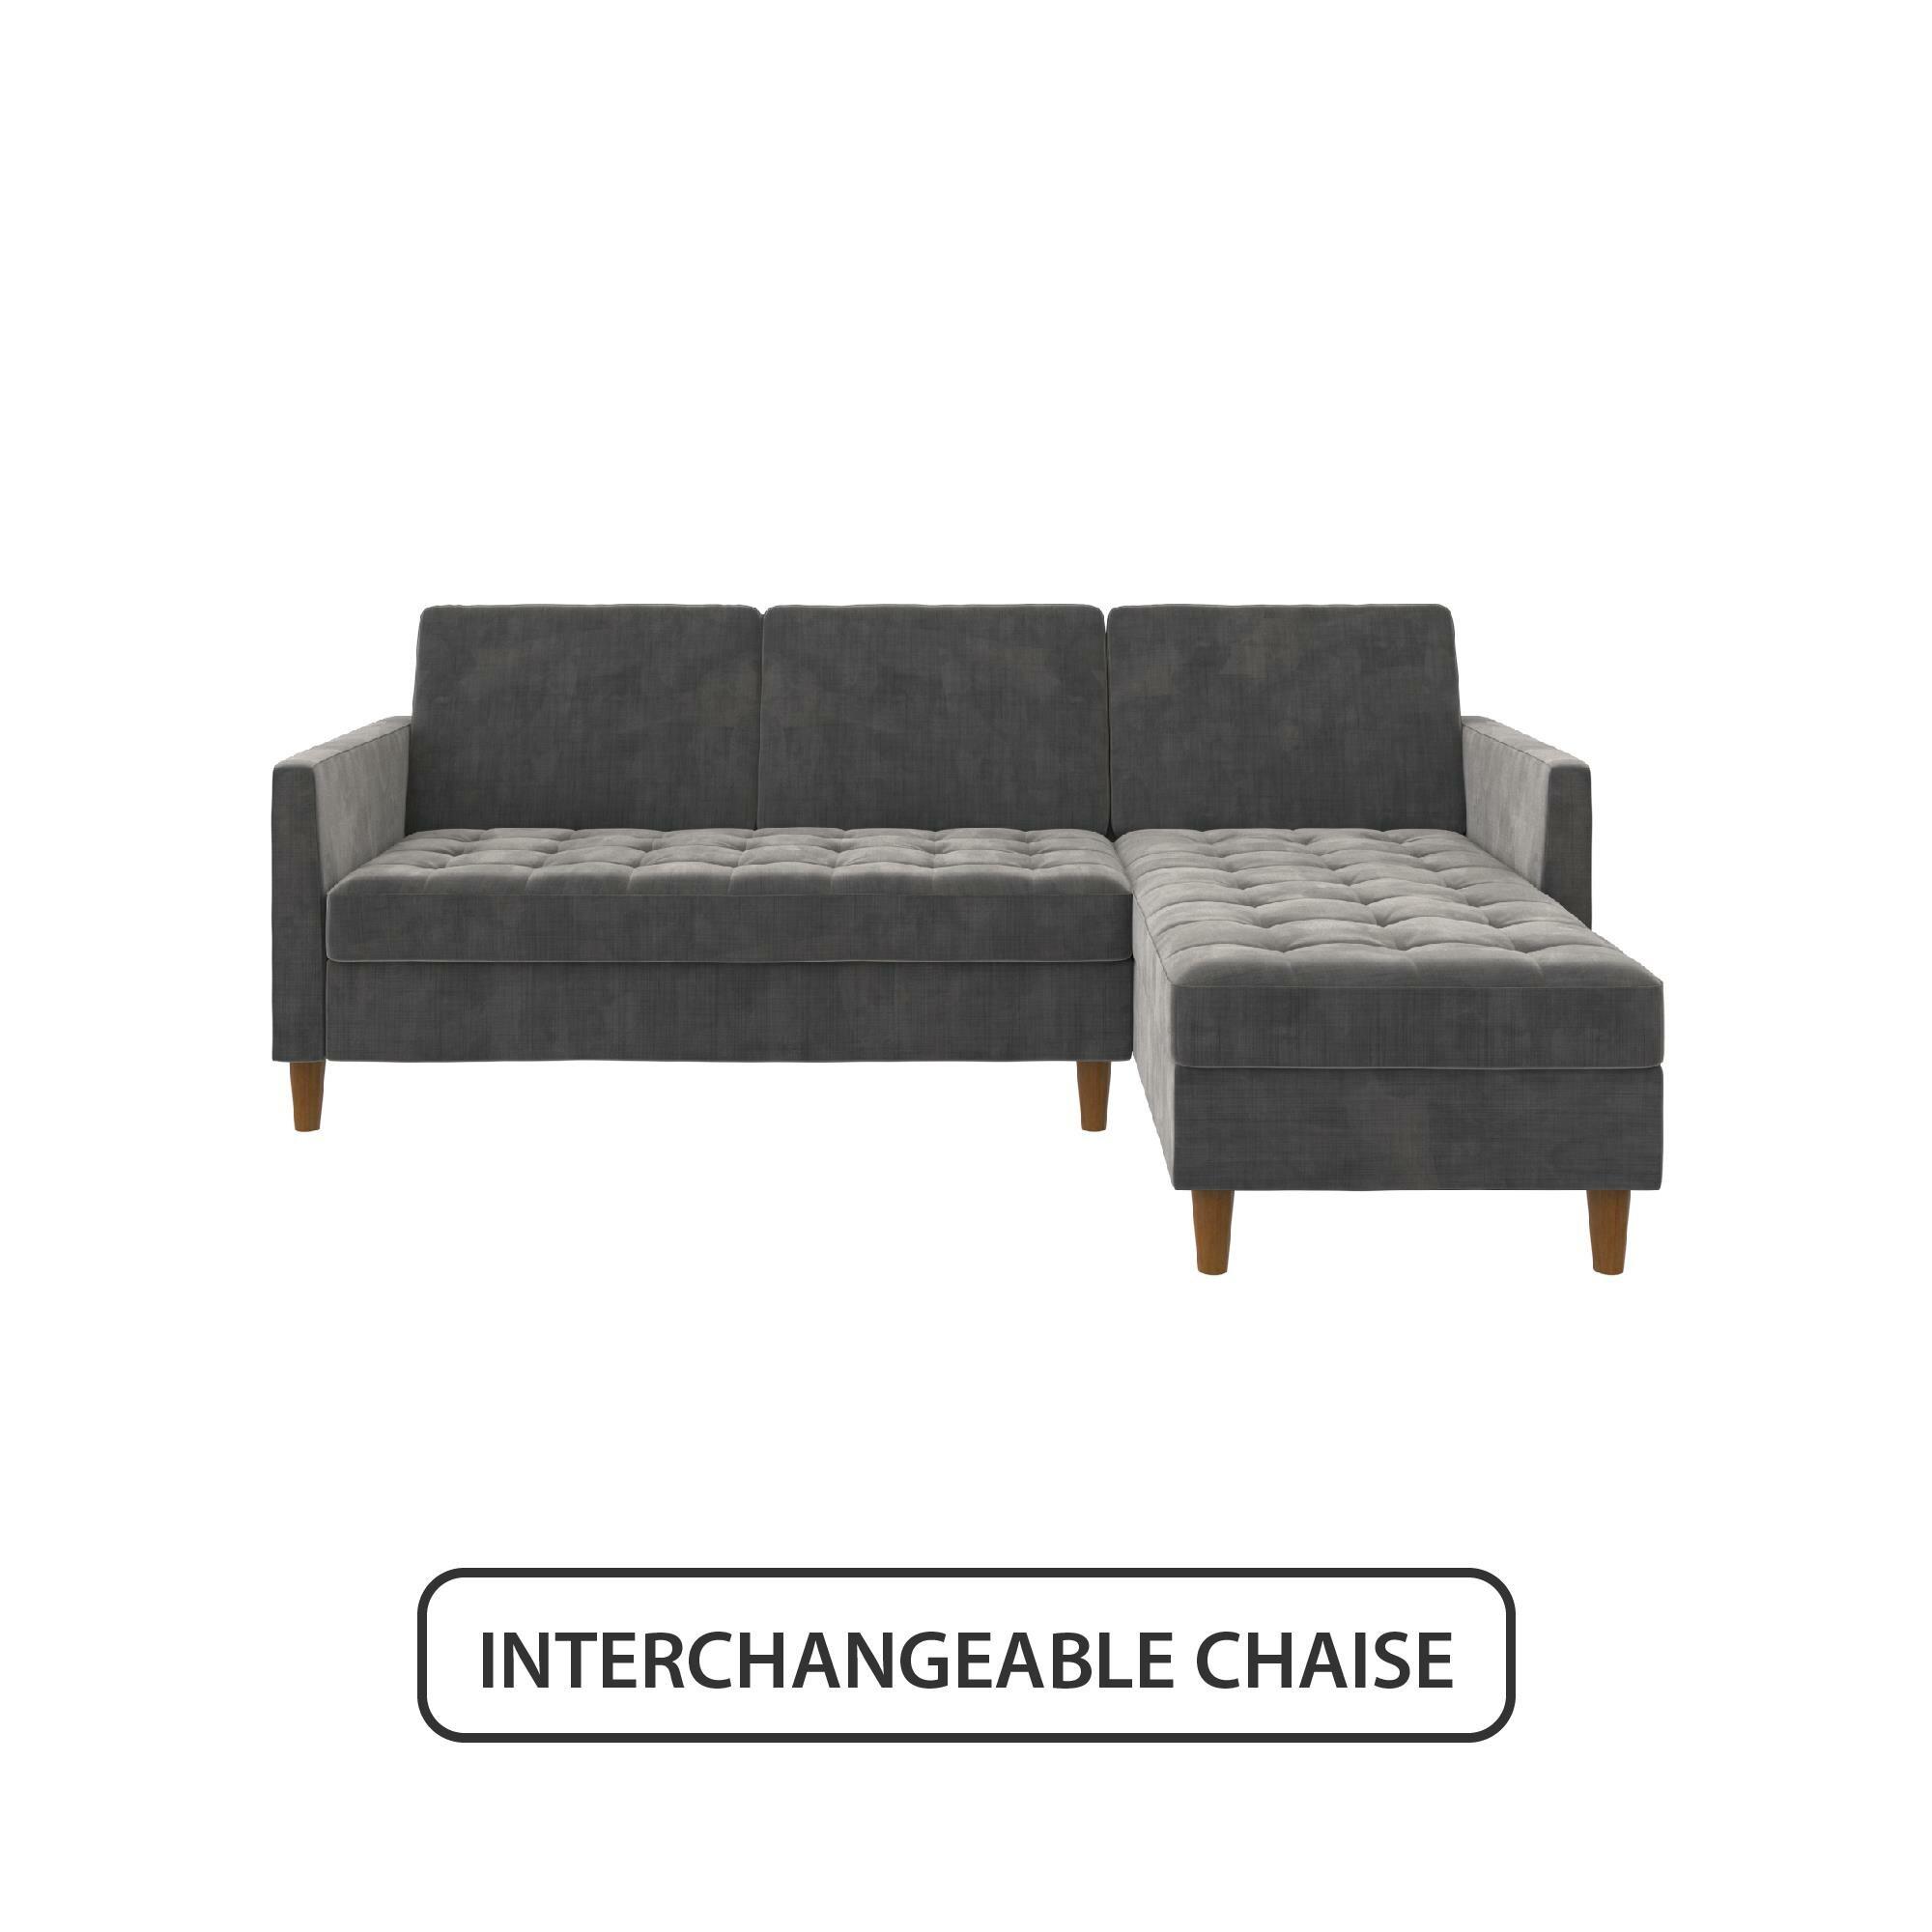 Surprising Bozeman Reversible Sleeper Sectional Theyellowbook Wood Chair Design Ideas Theyellowbookinfo